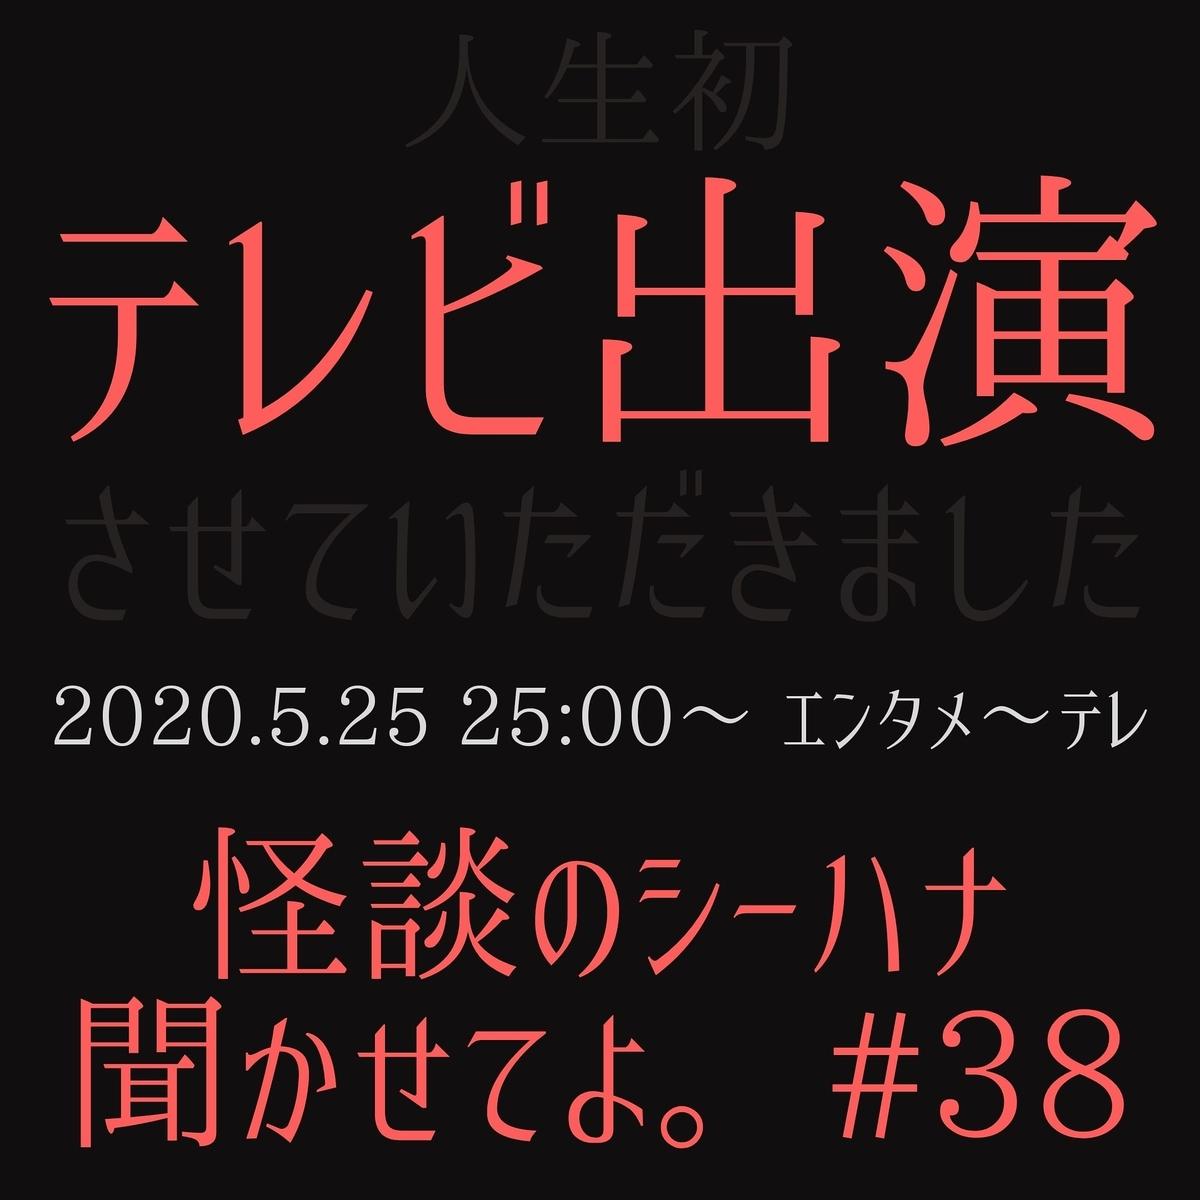 f:id:yukaitekietsu:20200526002103j:plain